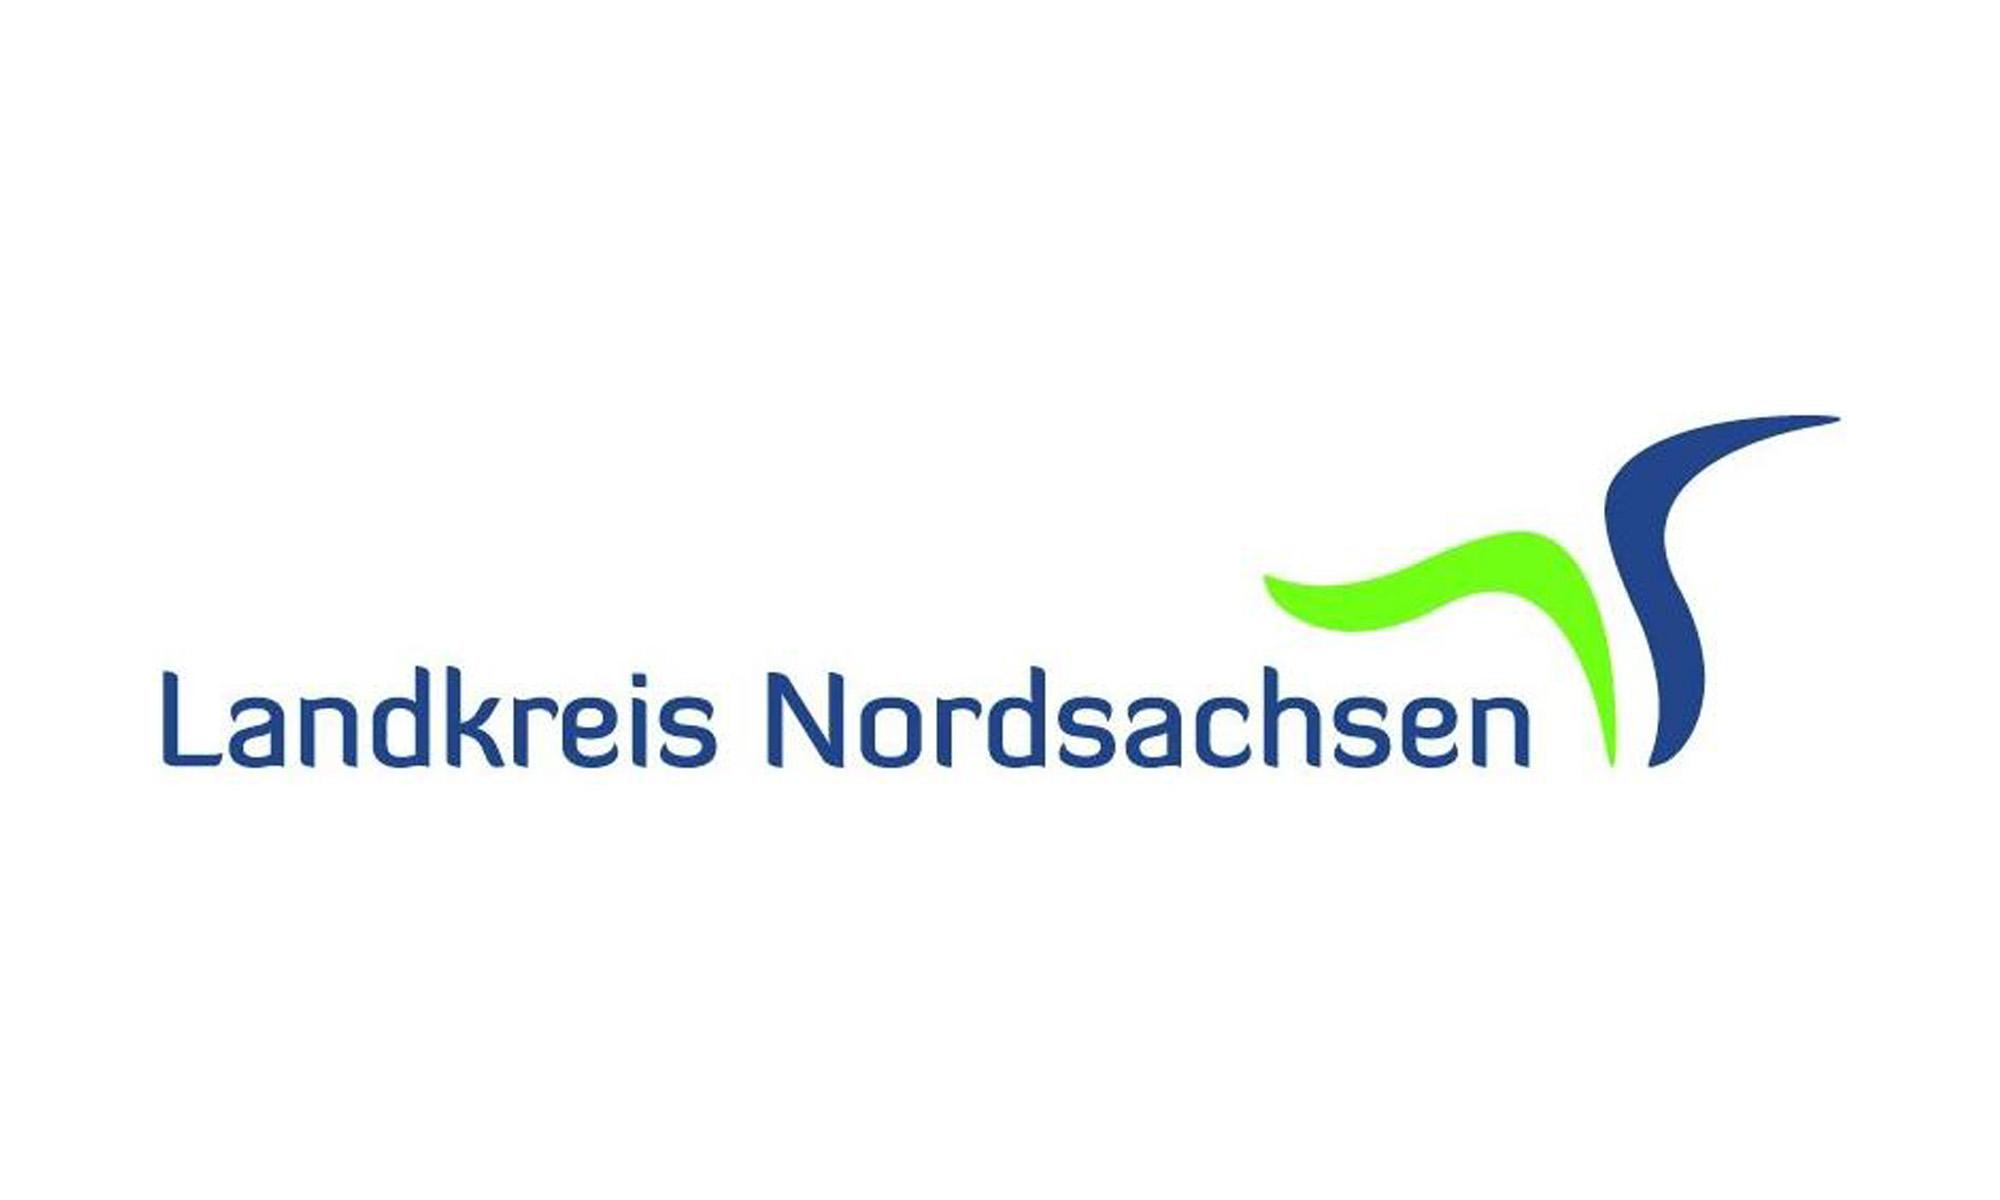 Landkreis Nordsachsen Torgau